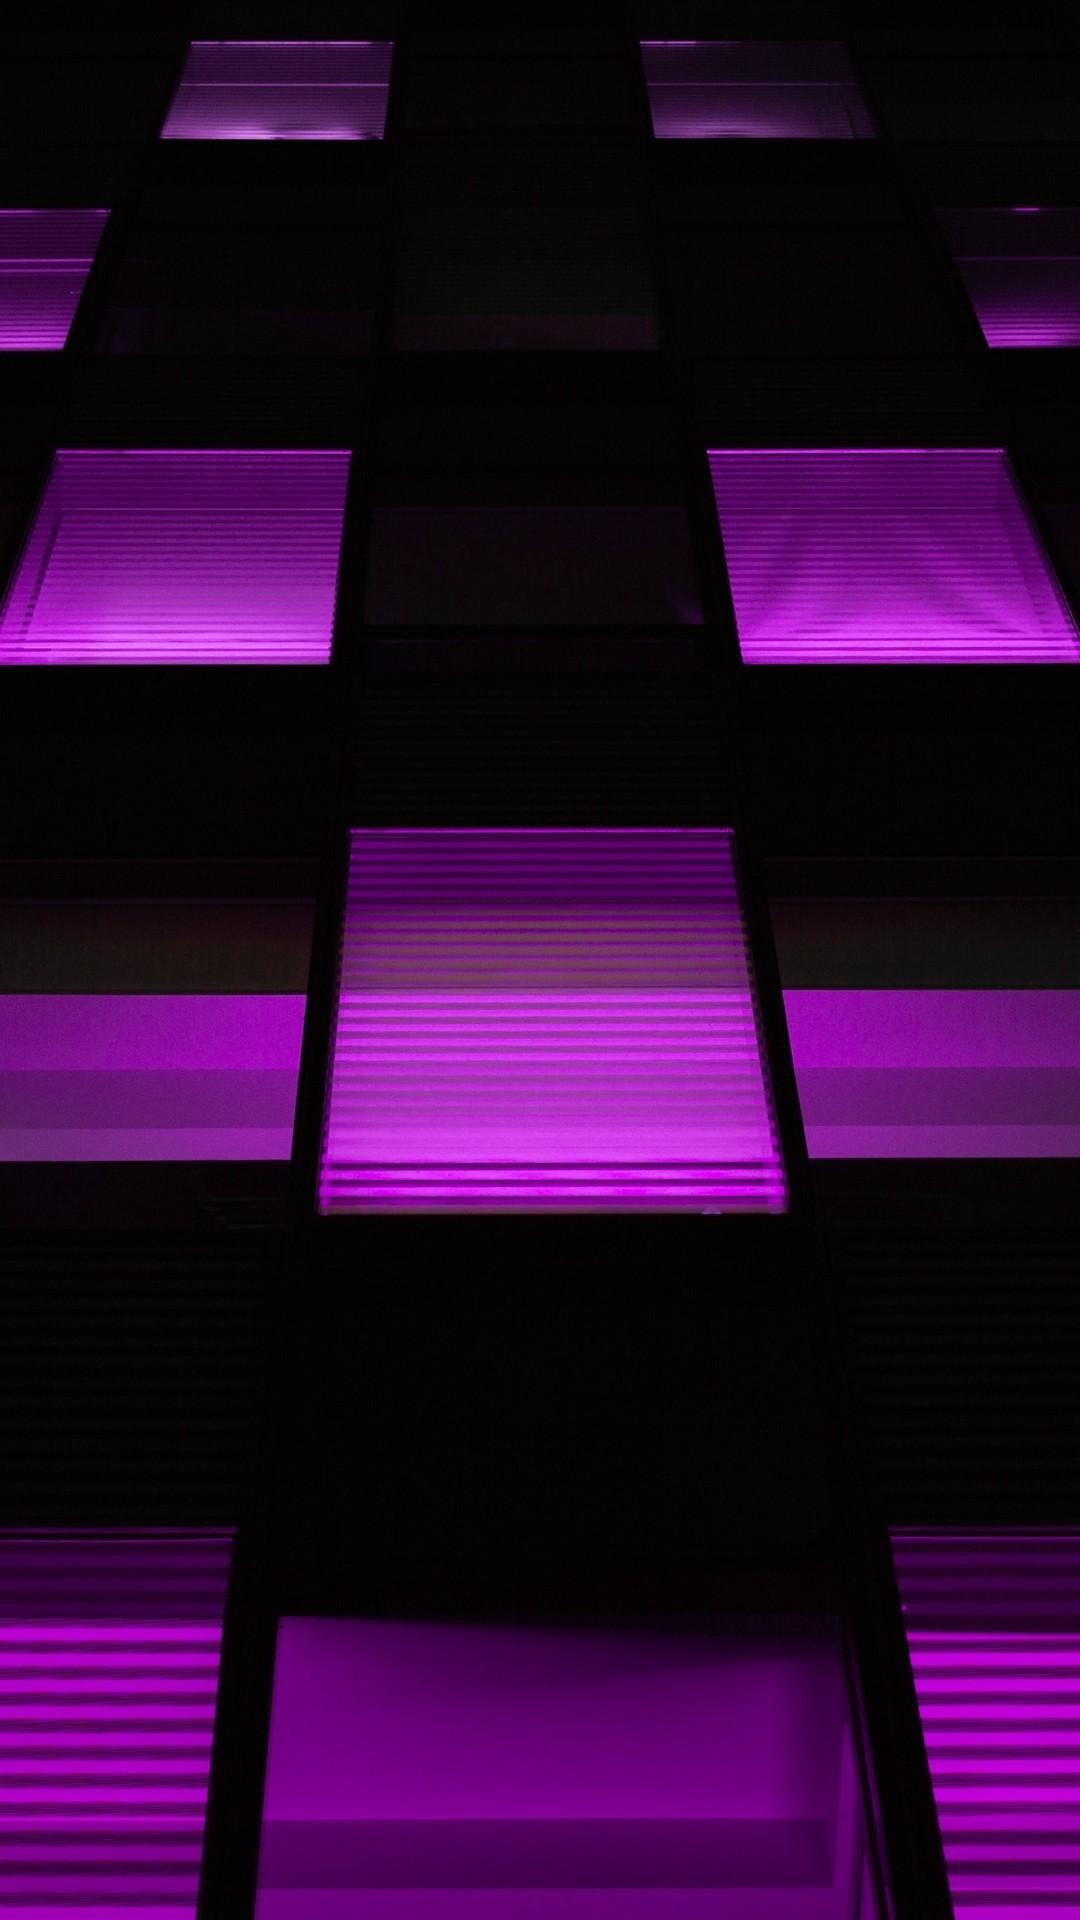 Neon phone wallpaper